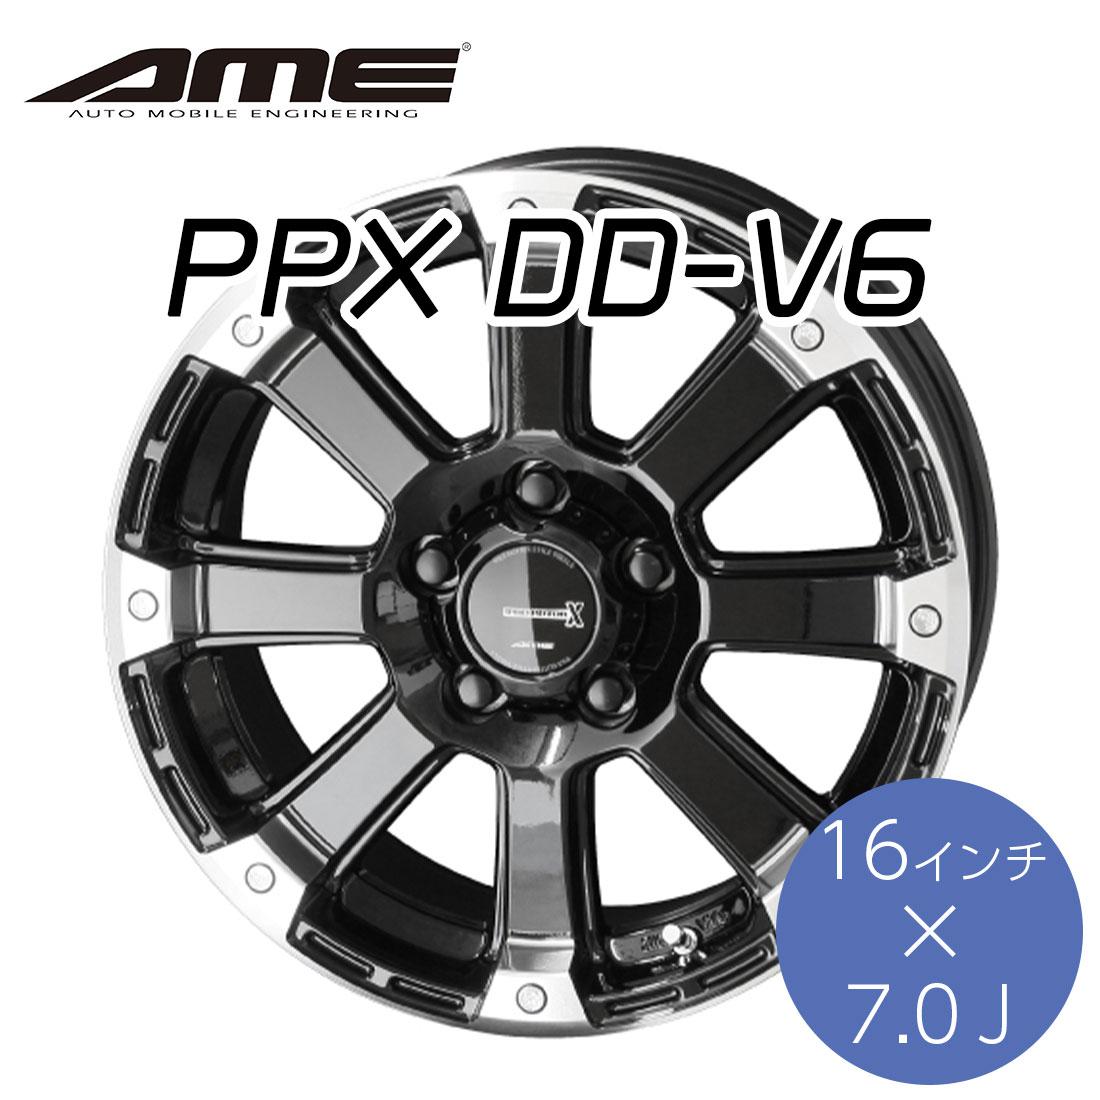 KYOHO ホイール PPX DD-V6 16×7.0J インチ 5H PCD 114.3 by AME 共豊 グロスブラック×エンドポリッシュ かっこいい 車